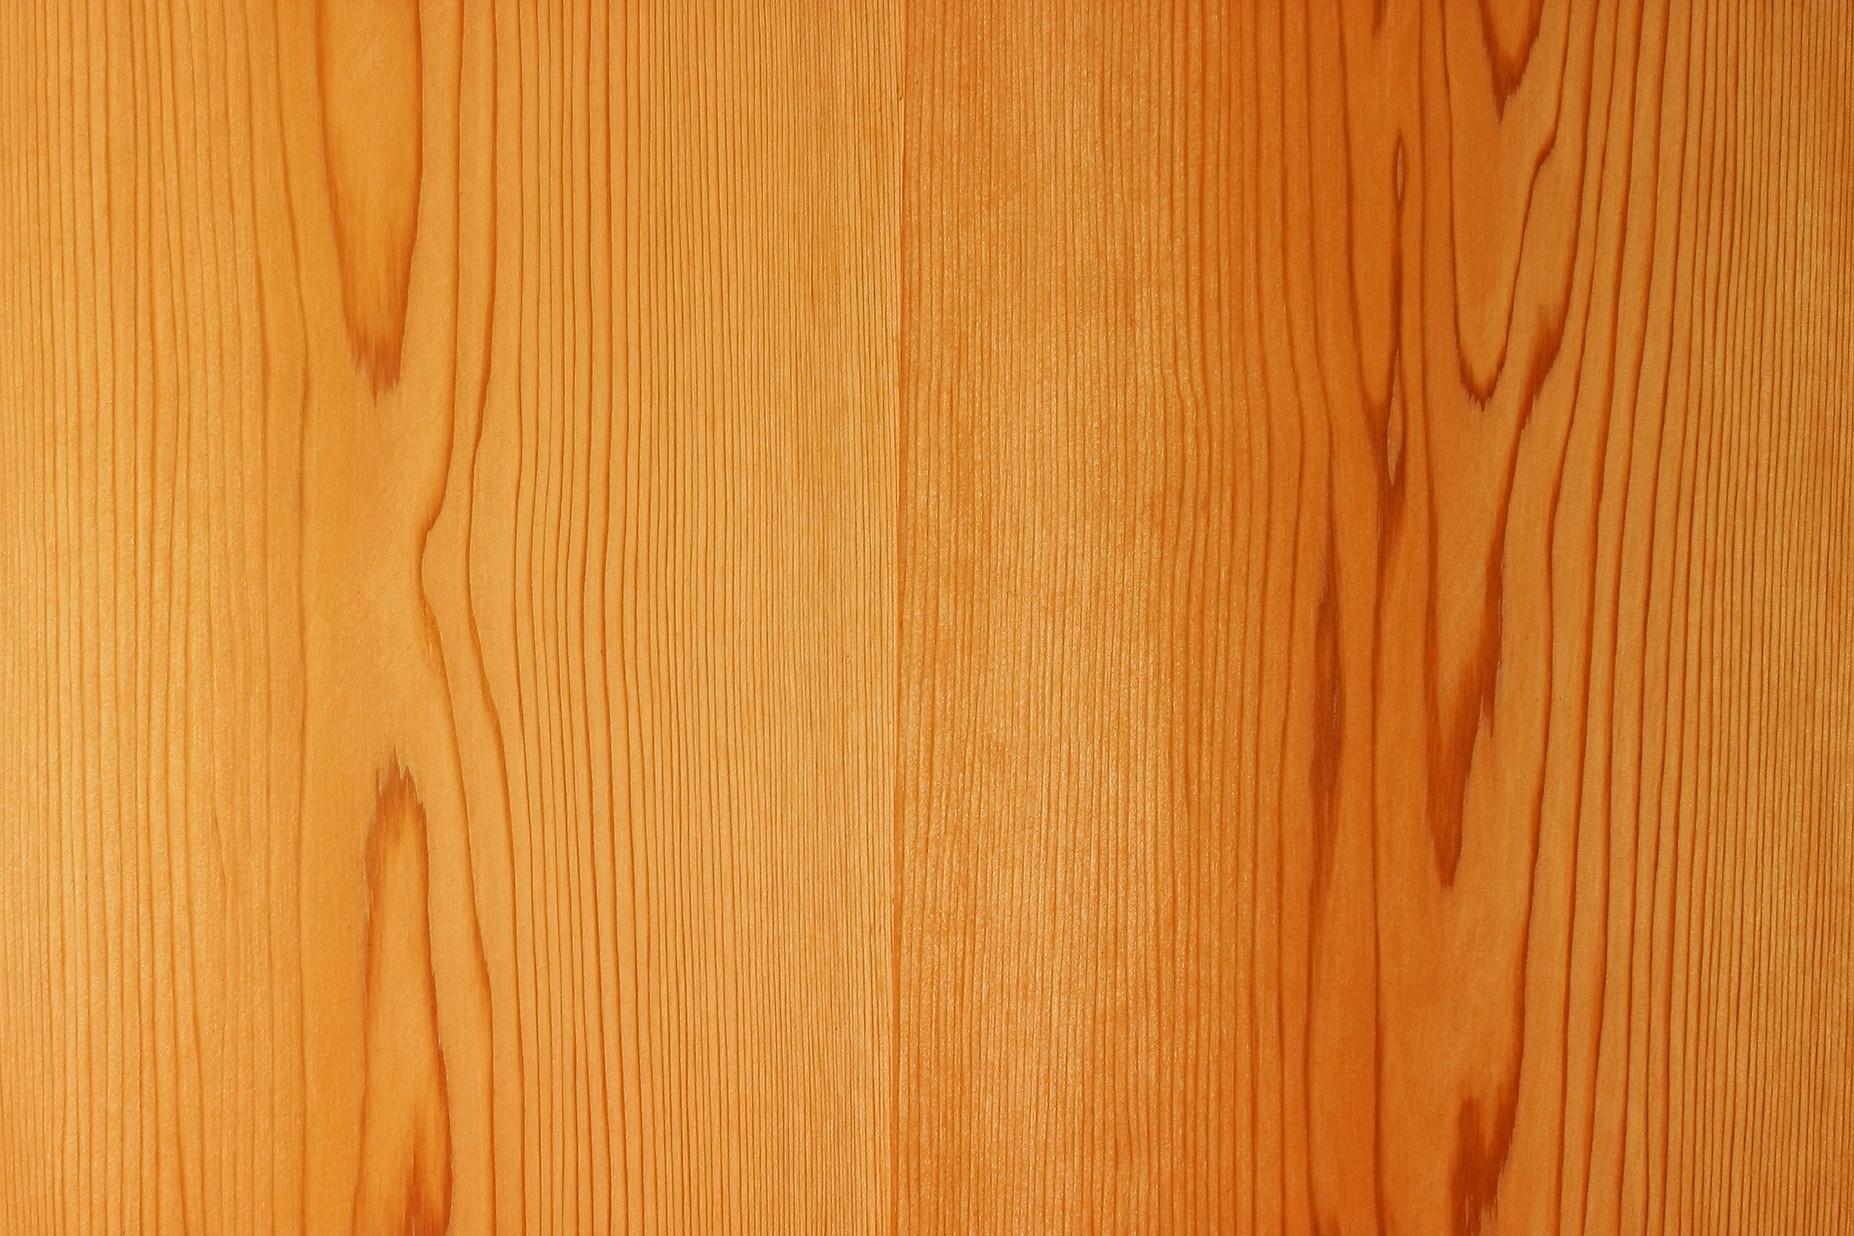 wood-texture_00004.jpg